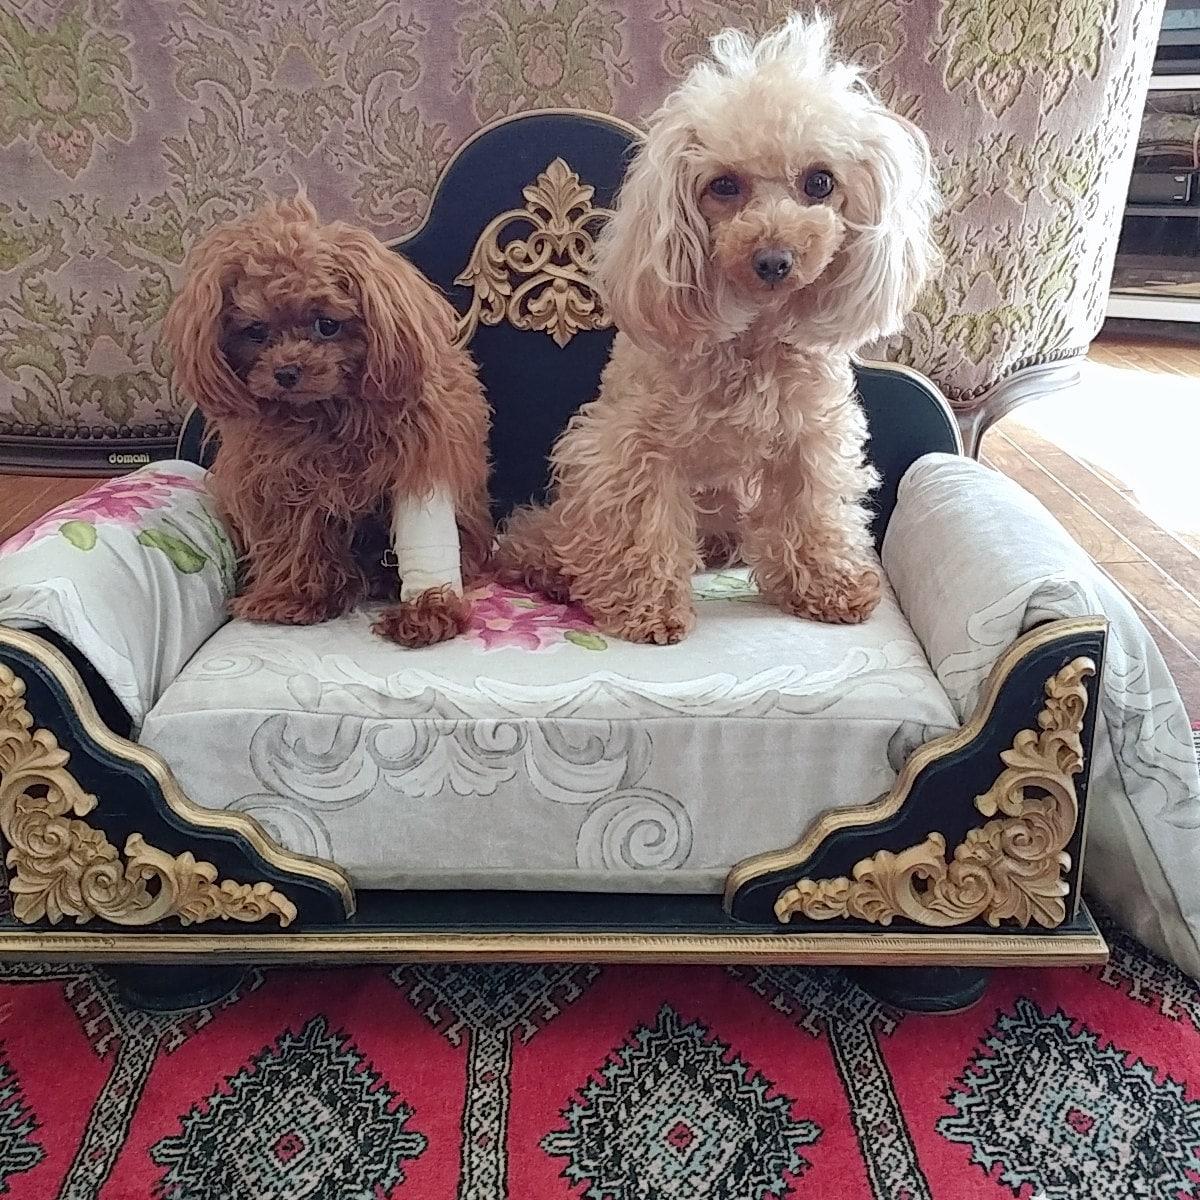 SACHIKO HIRATA added a photo of their purchase